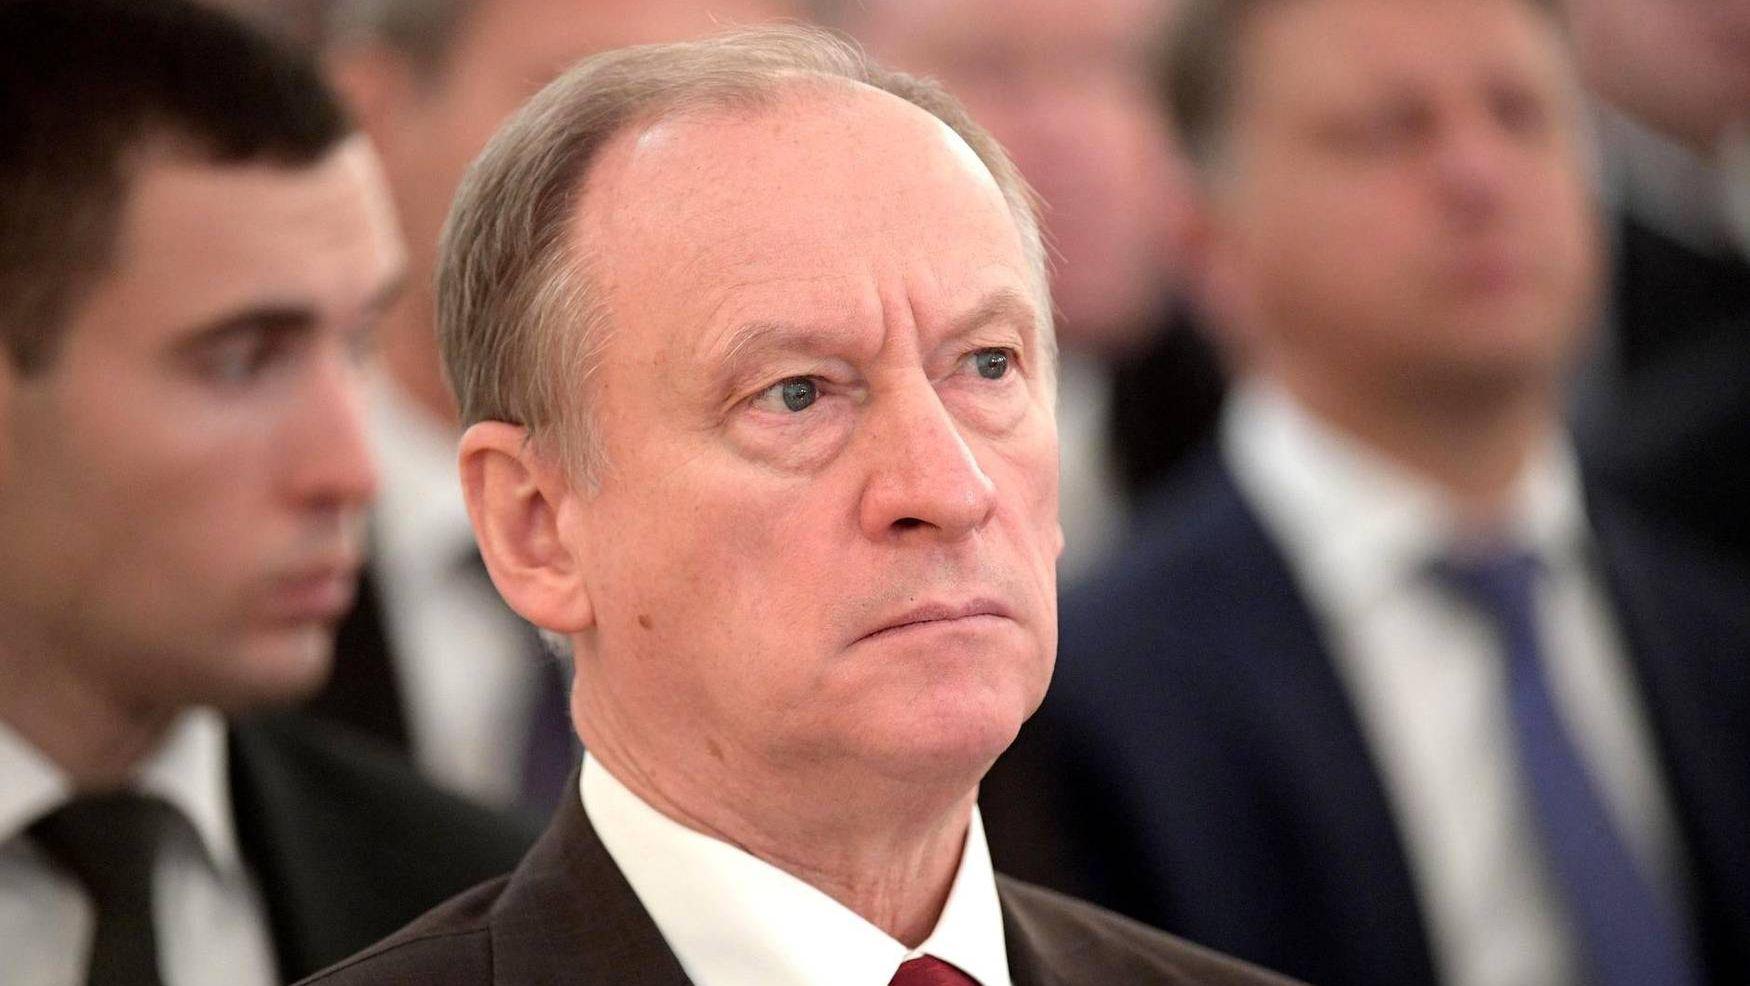 Николай Патрушев (СС) kremlin.ru